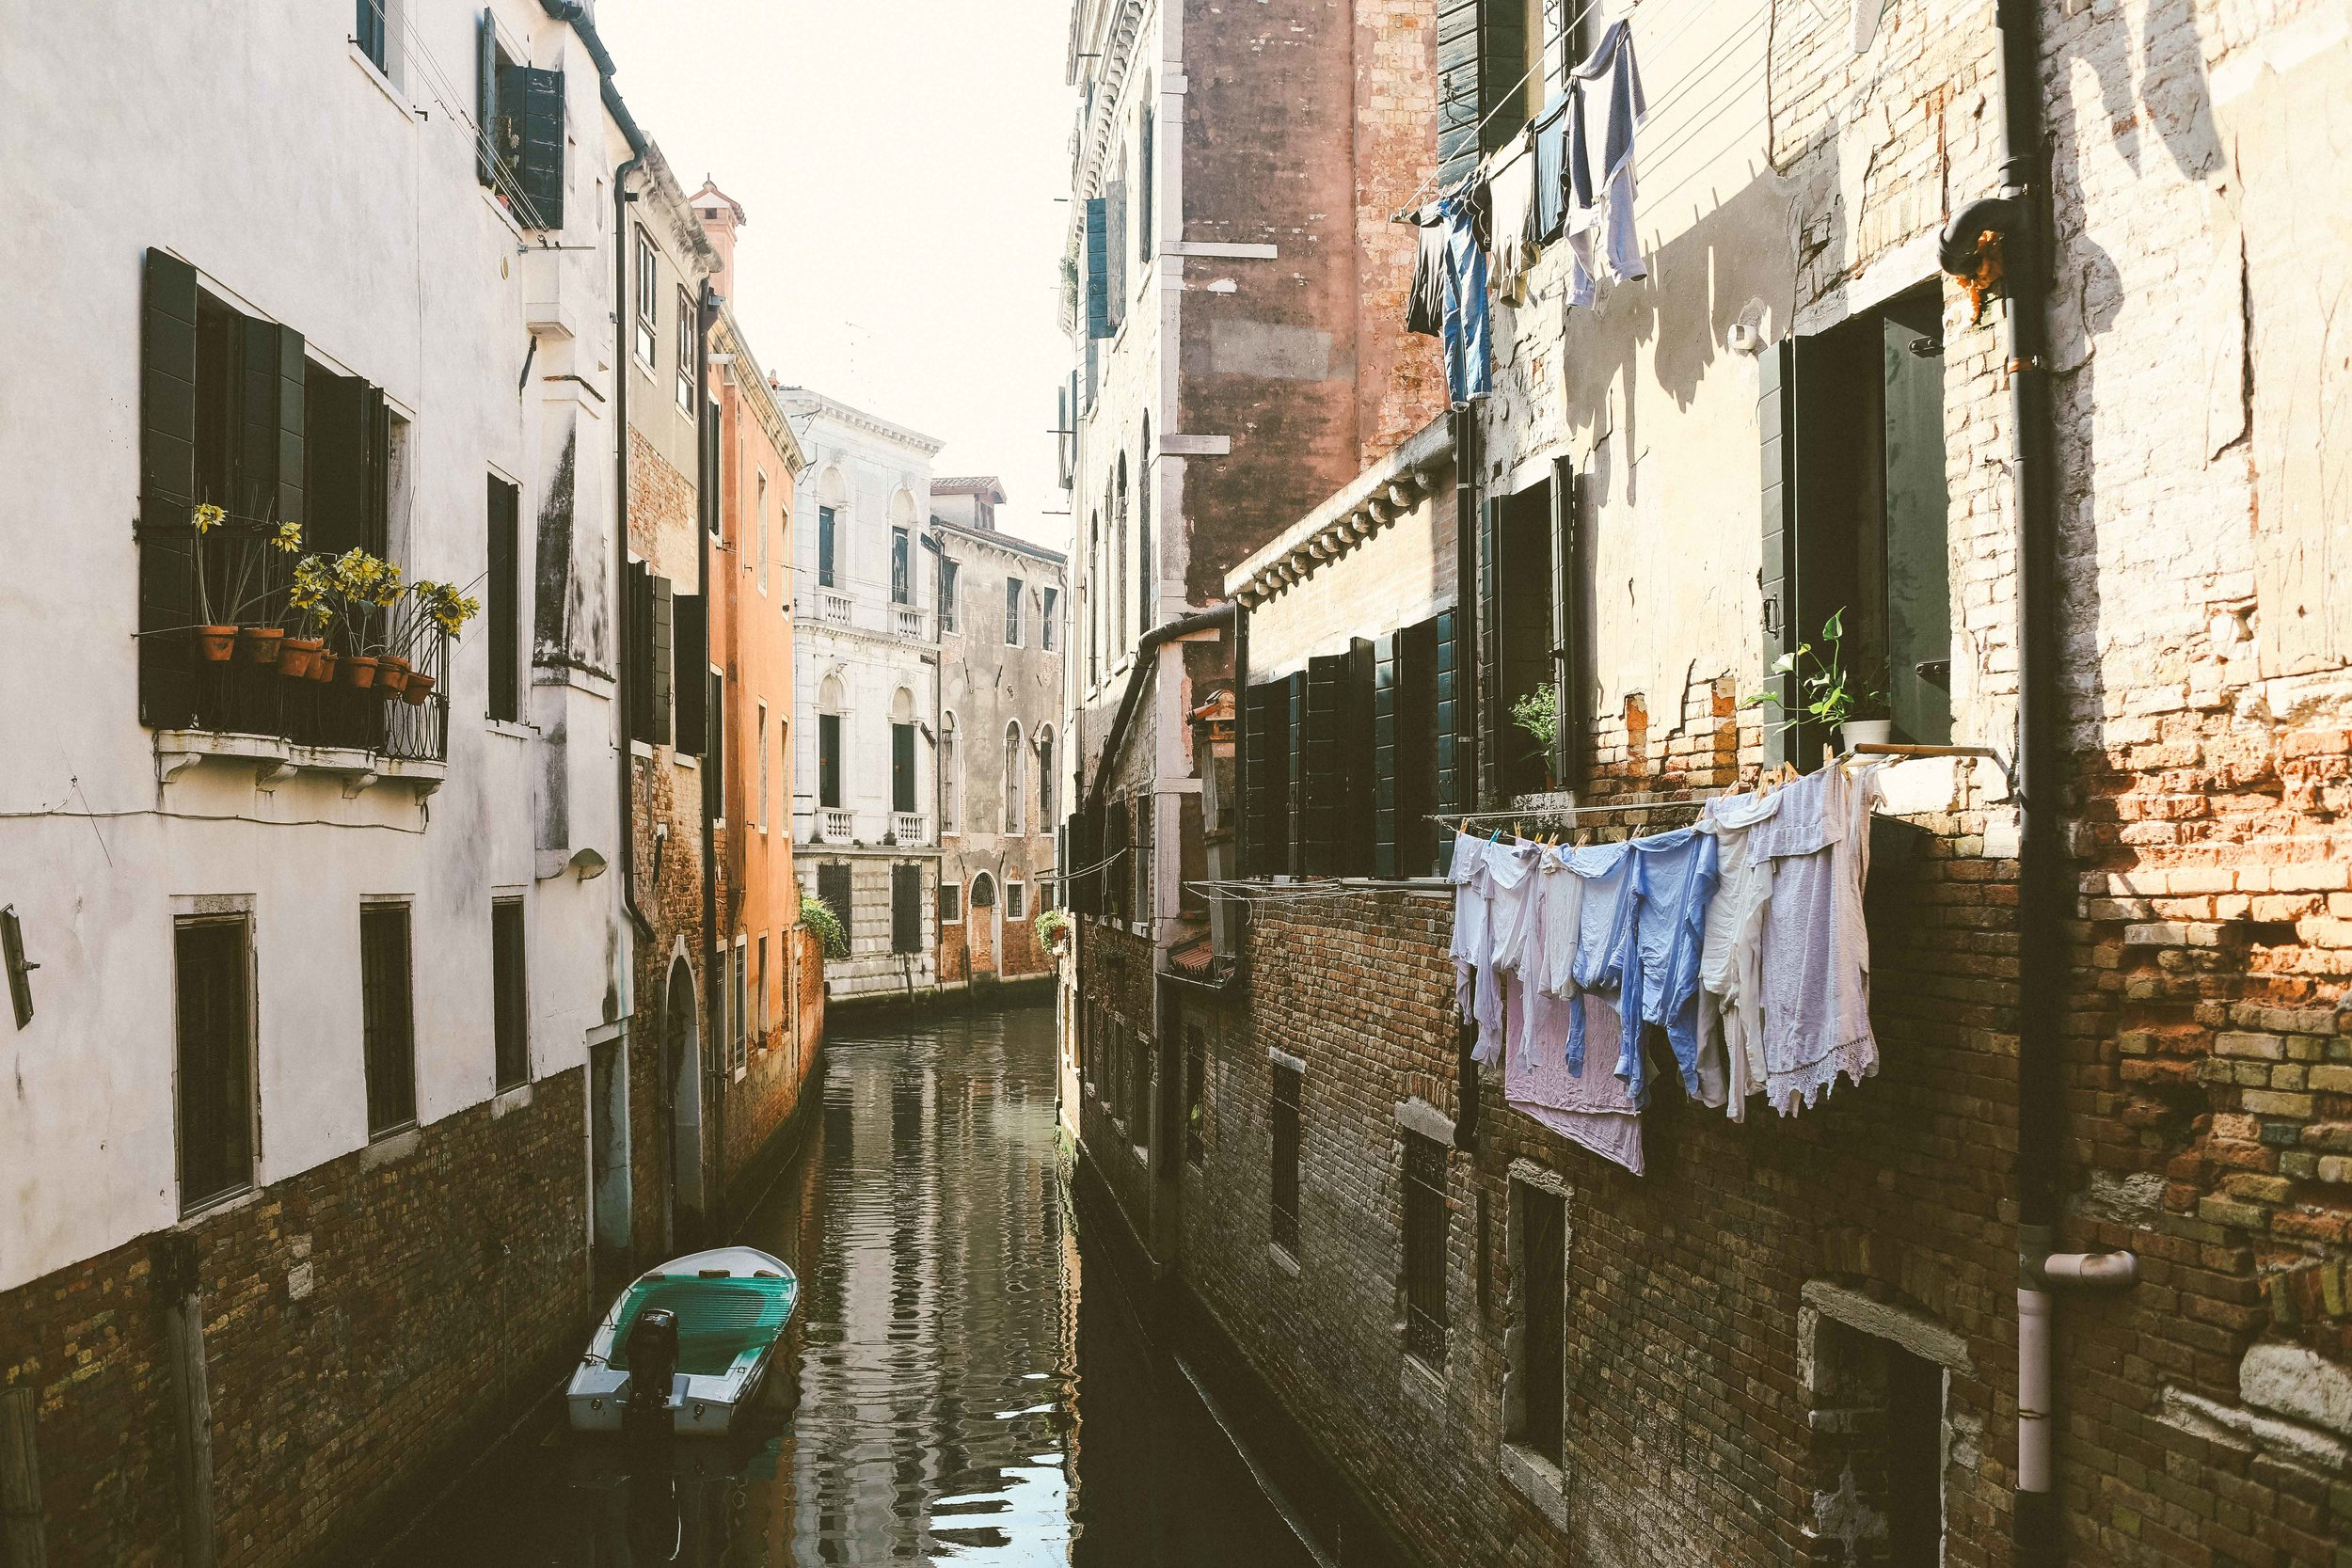 Street_Photographer_Venice_Italy_2.jpg